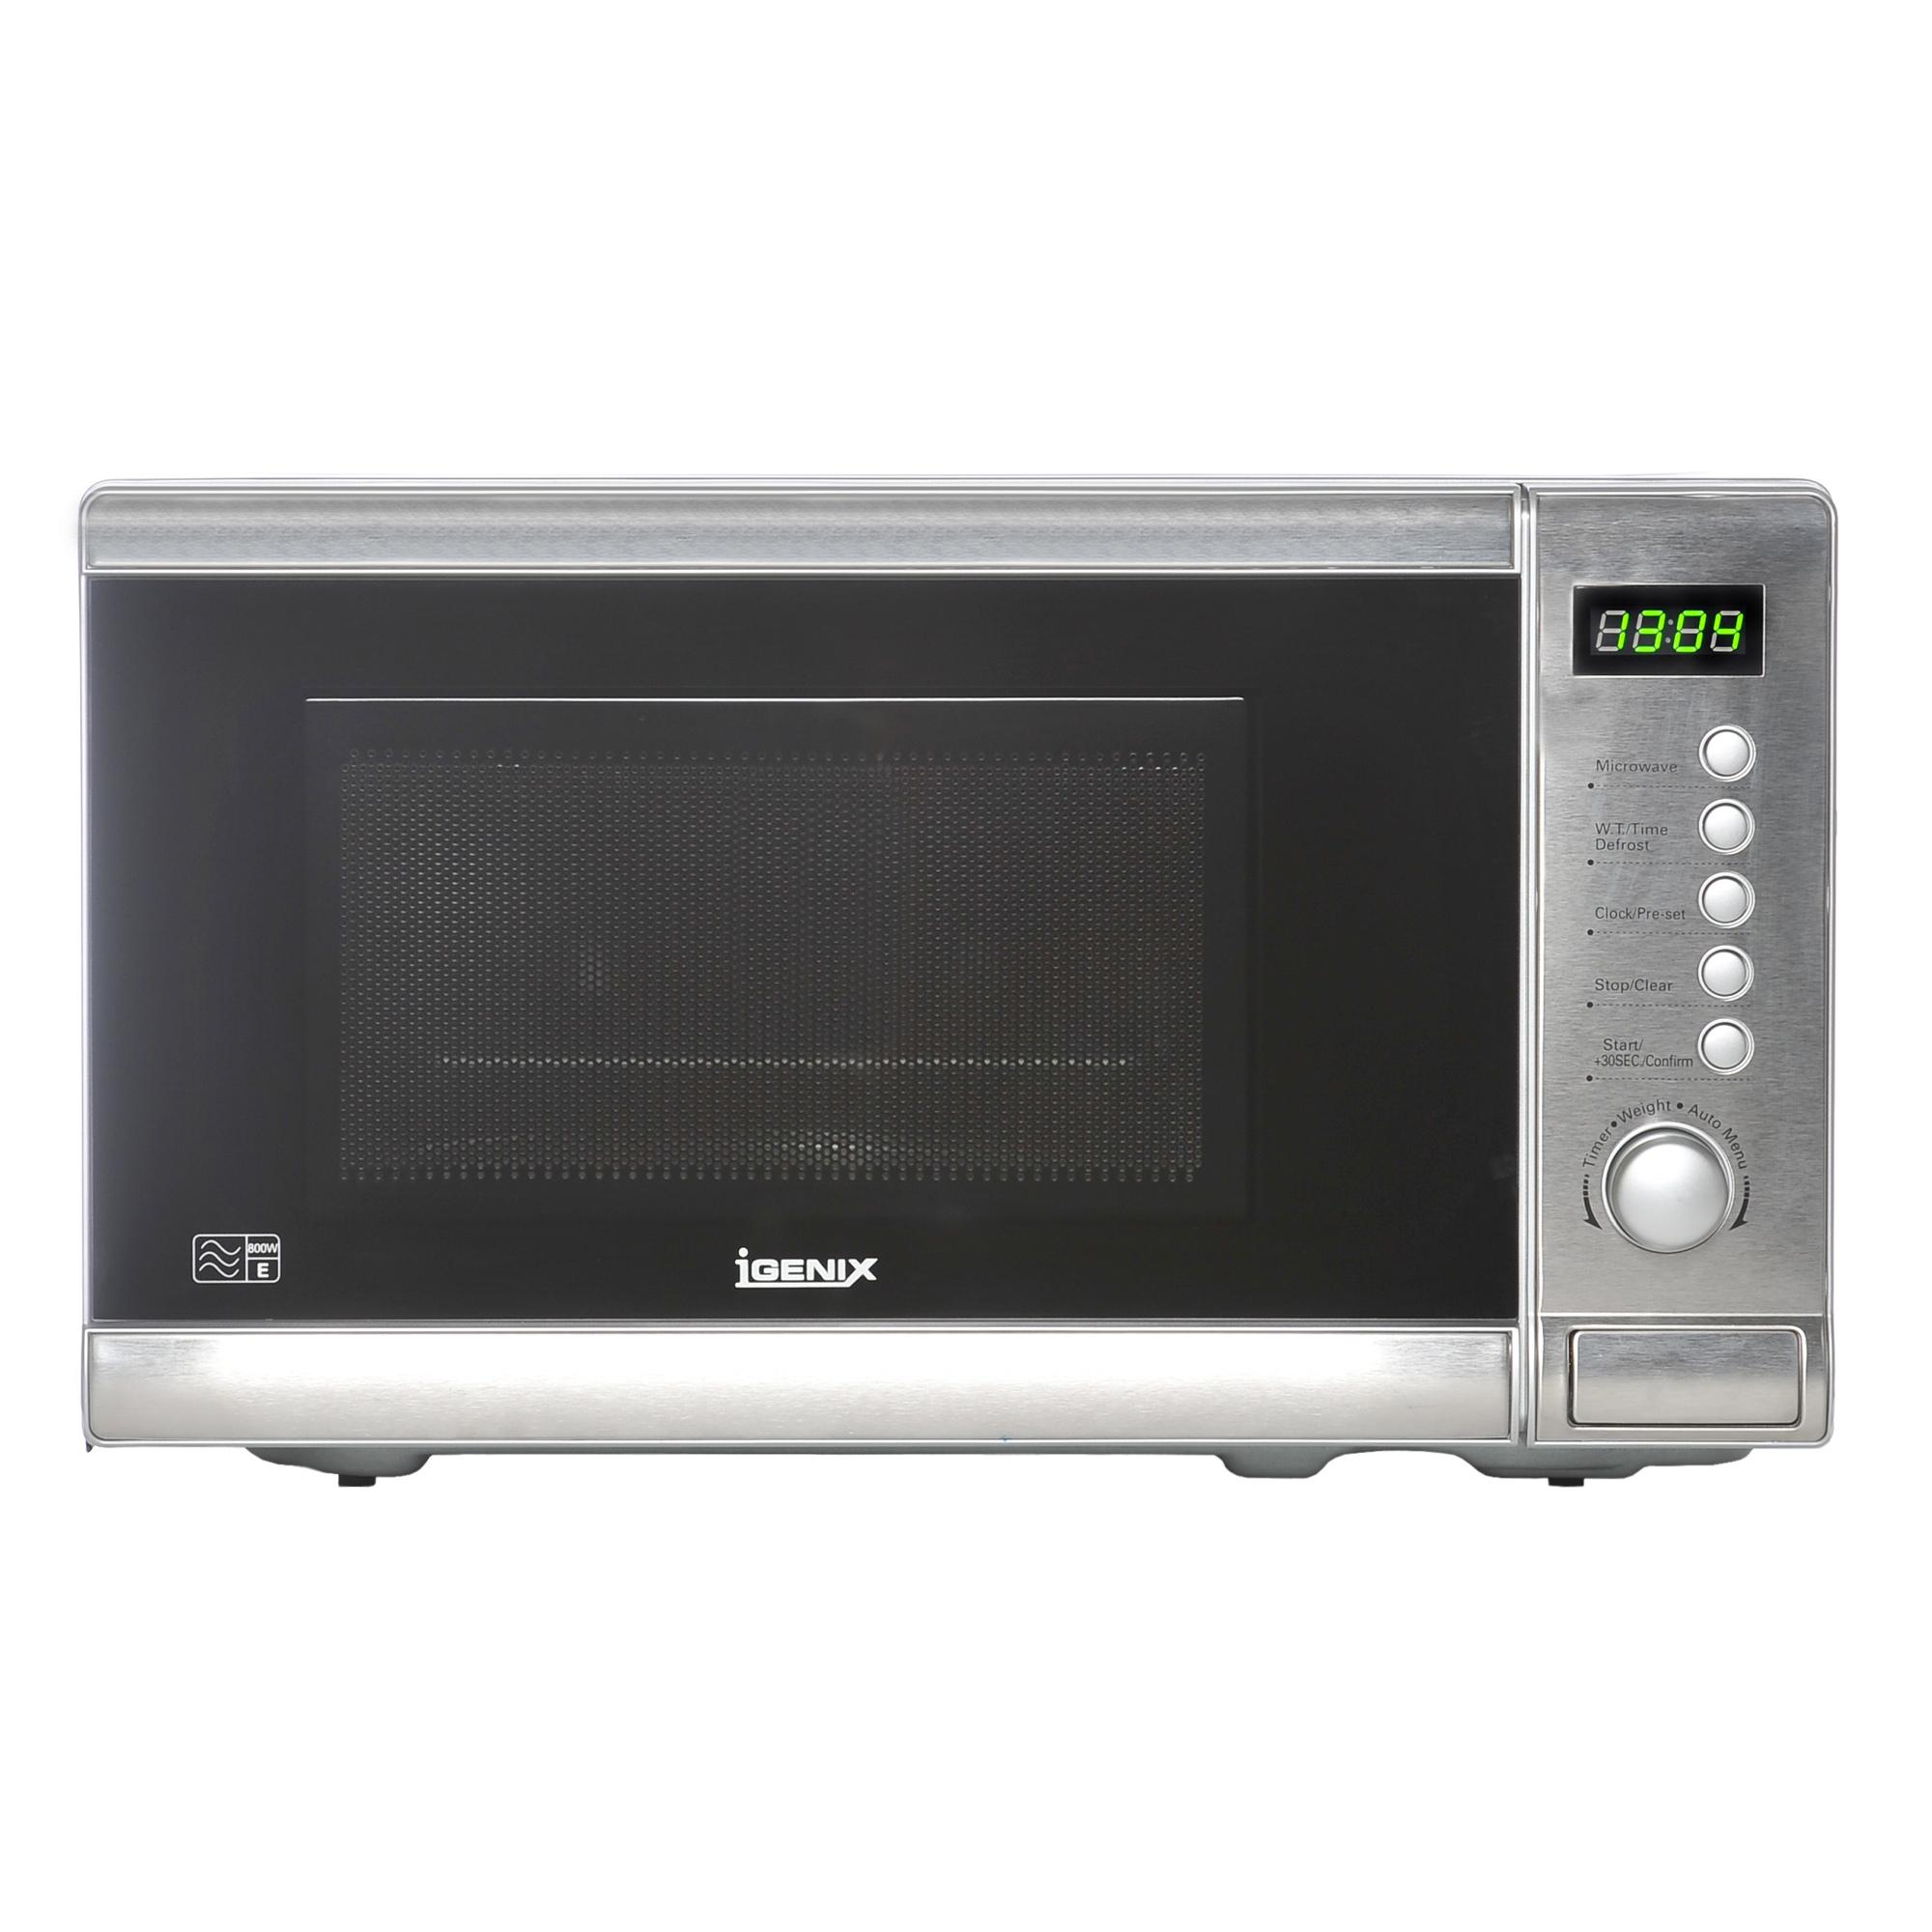 Igenix 20 Litre Microwave